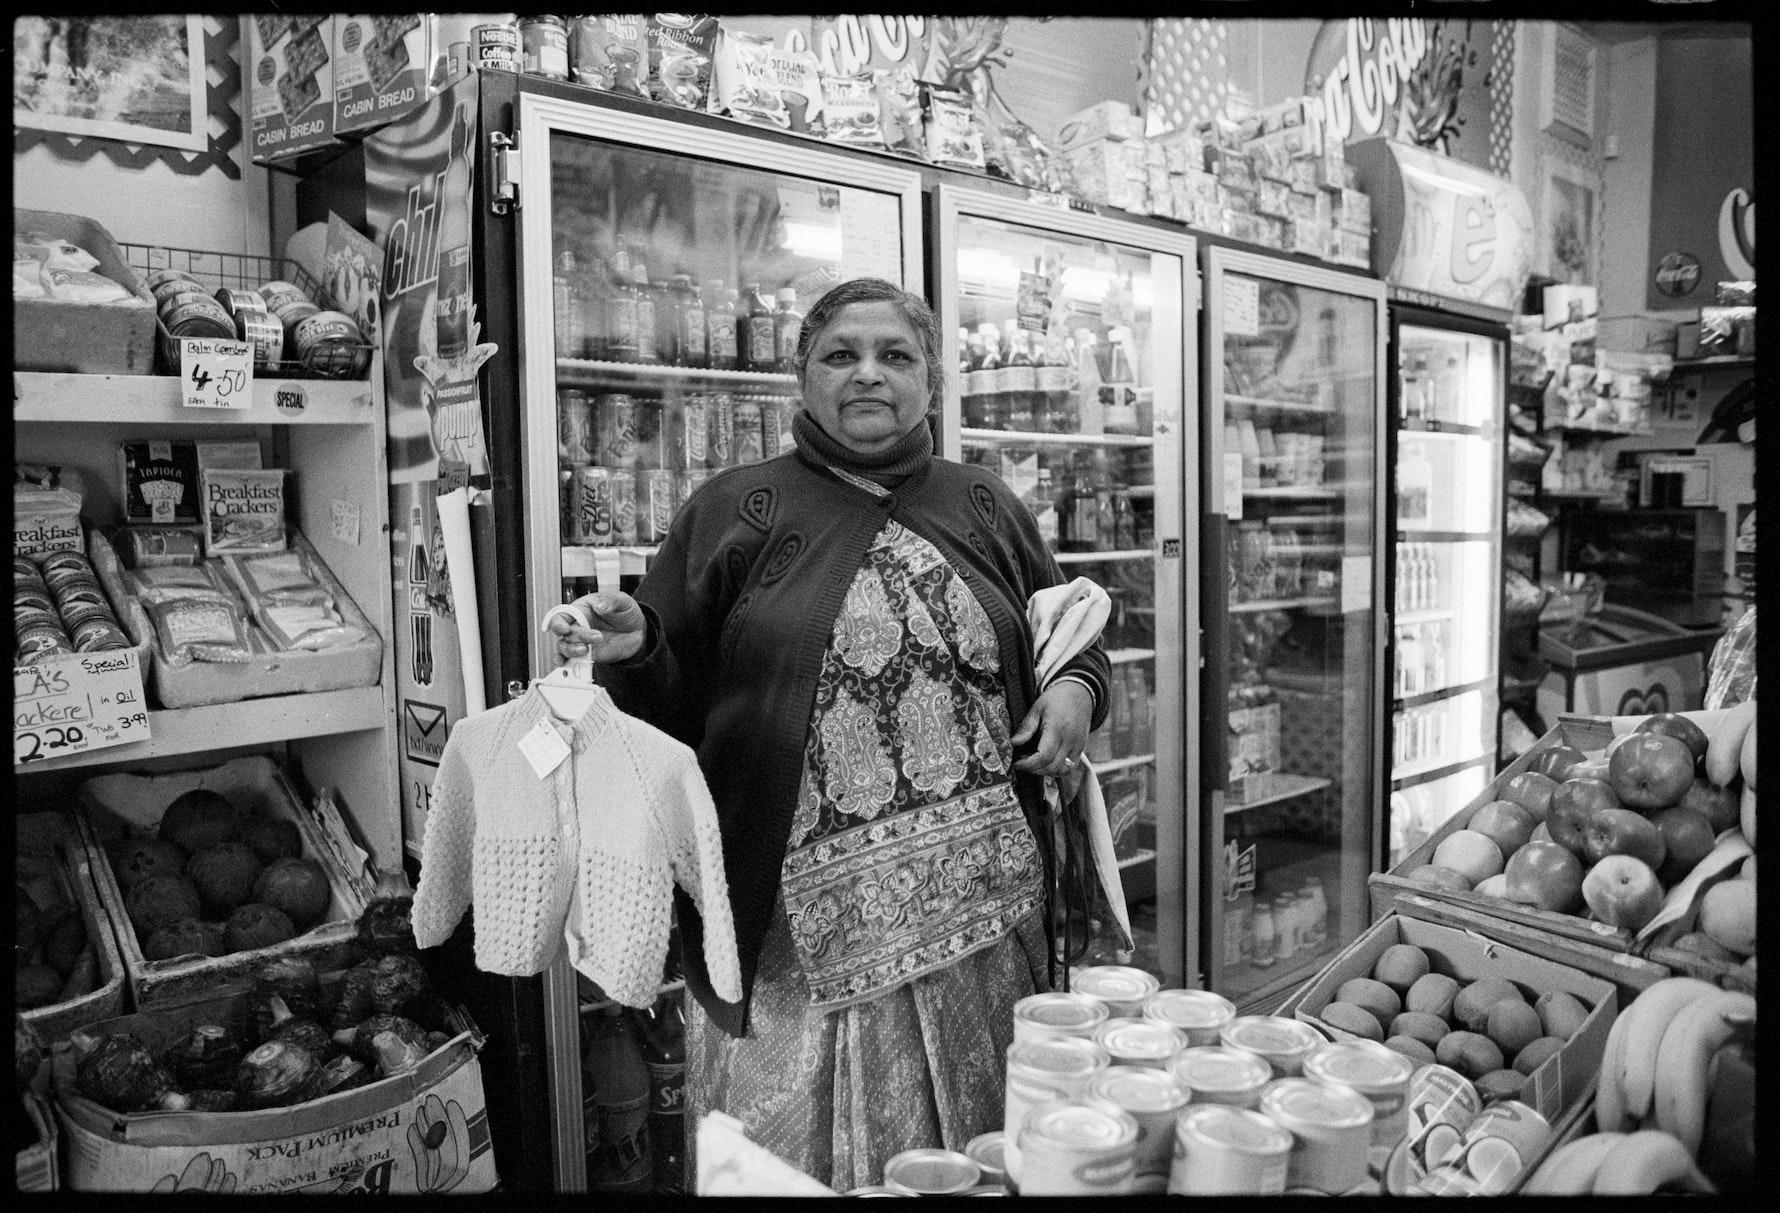 Colombo Street 2002